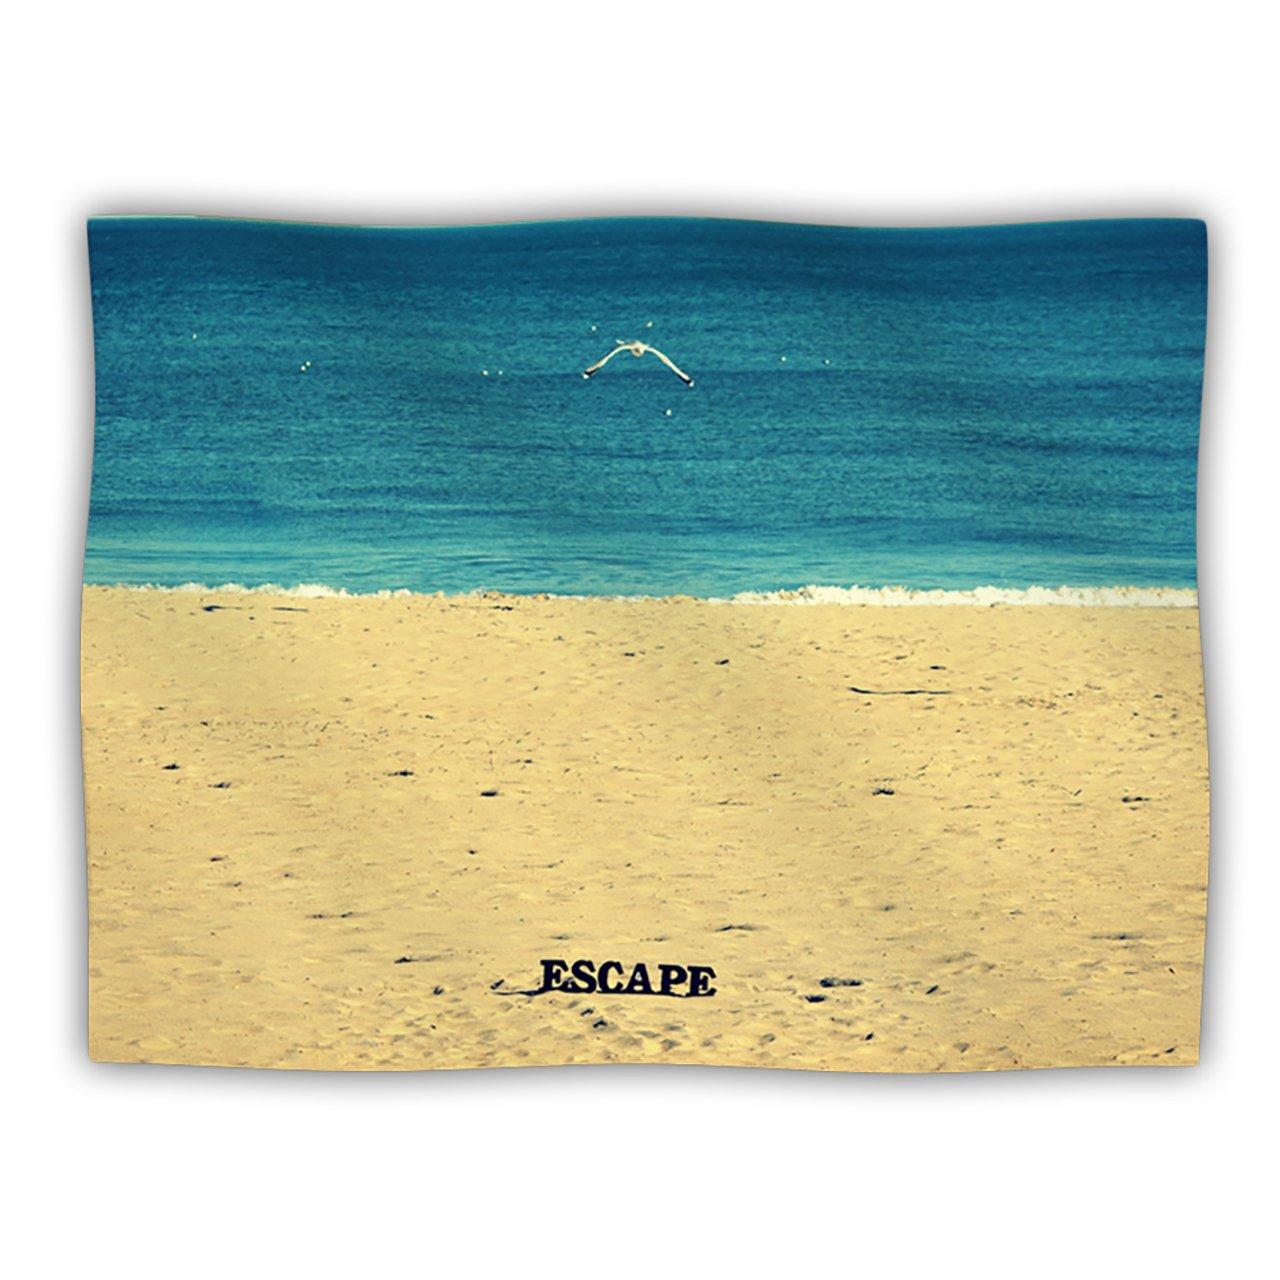 Kess InHouse Robin Dickinson Escape Beach Sand Pet Dog Blanket, 60 by 50-Inch